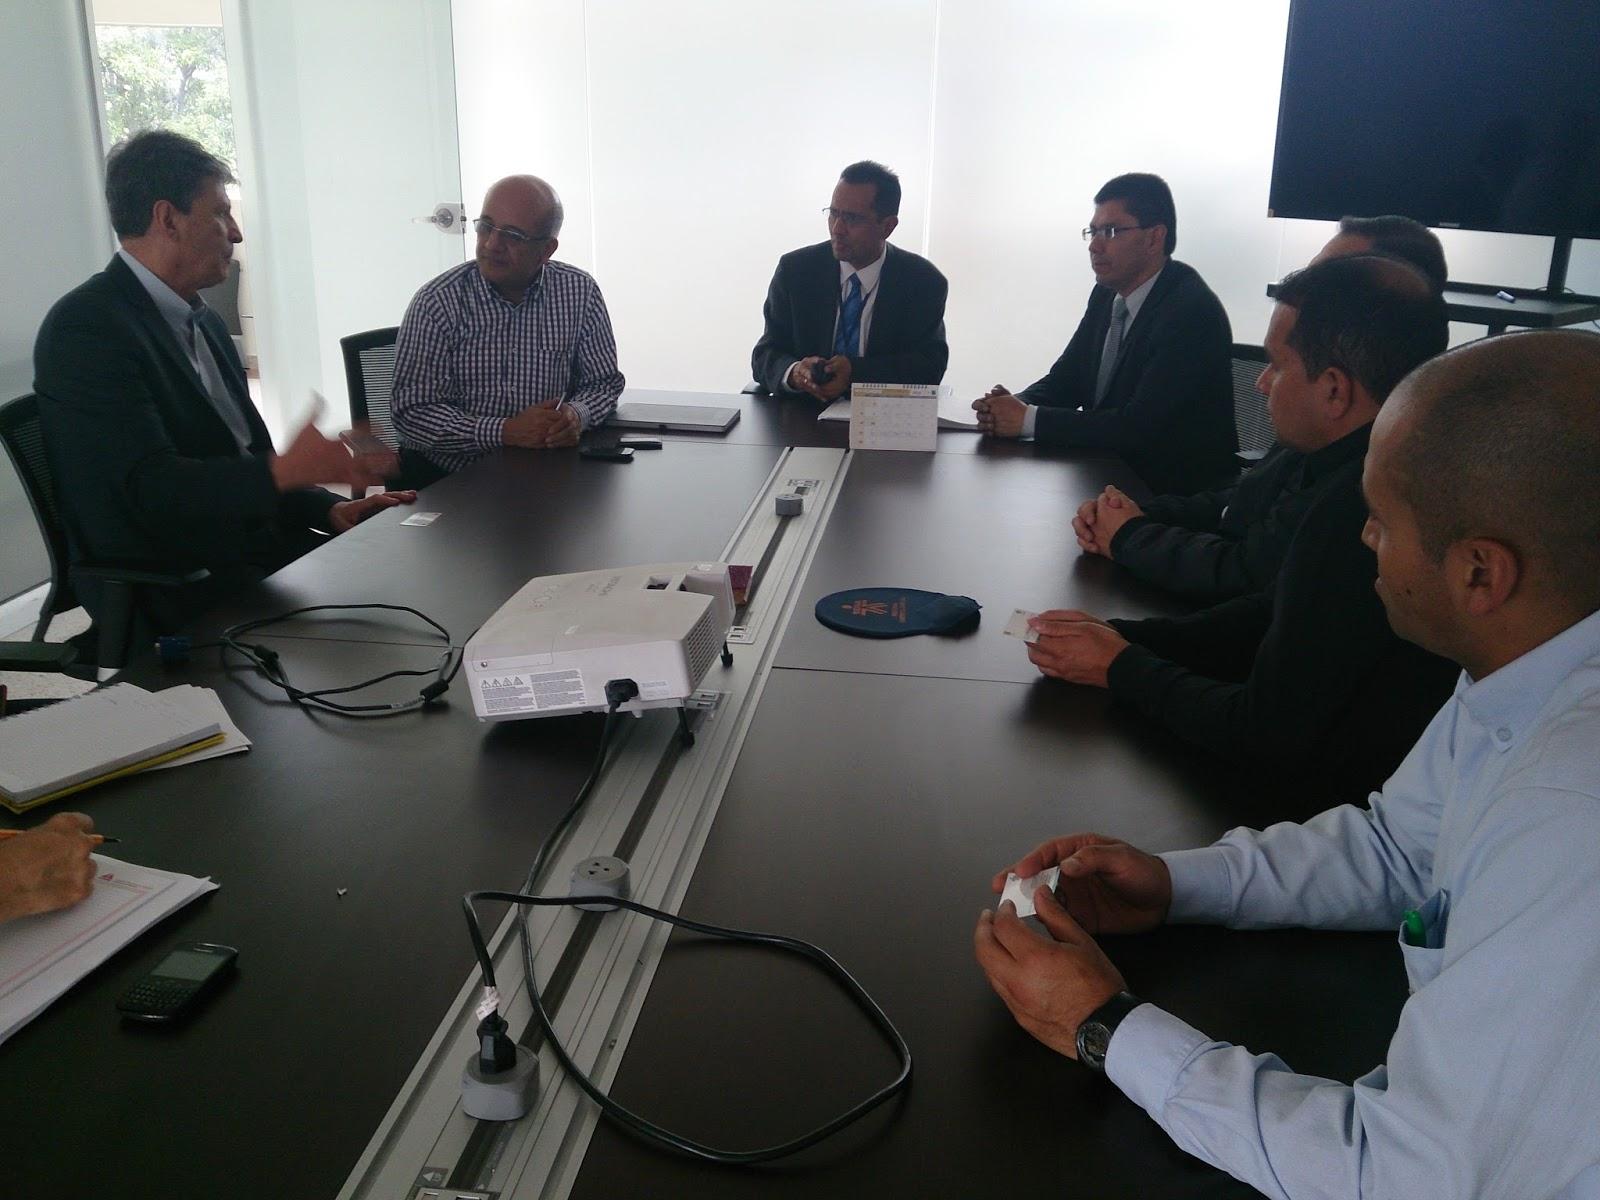 Centro Metalmec Nico Sena Regional Distrito Capital Visita De General Motors Al Cmm